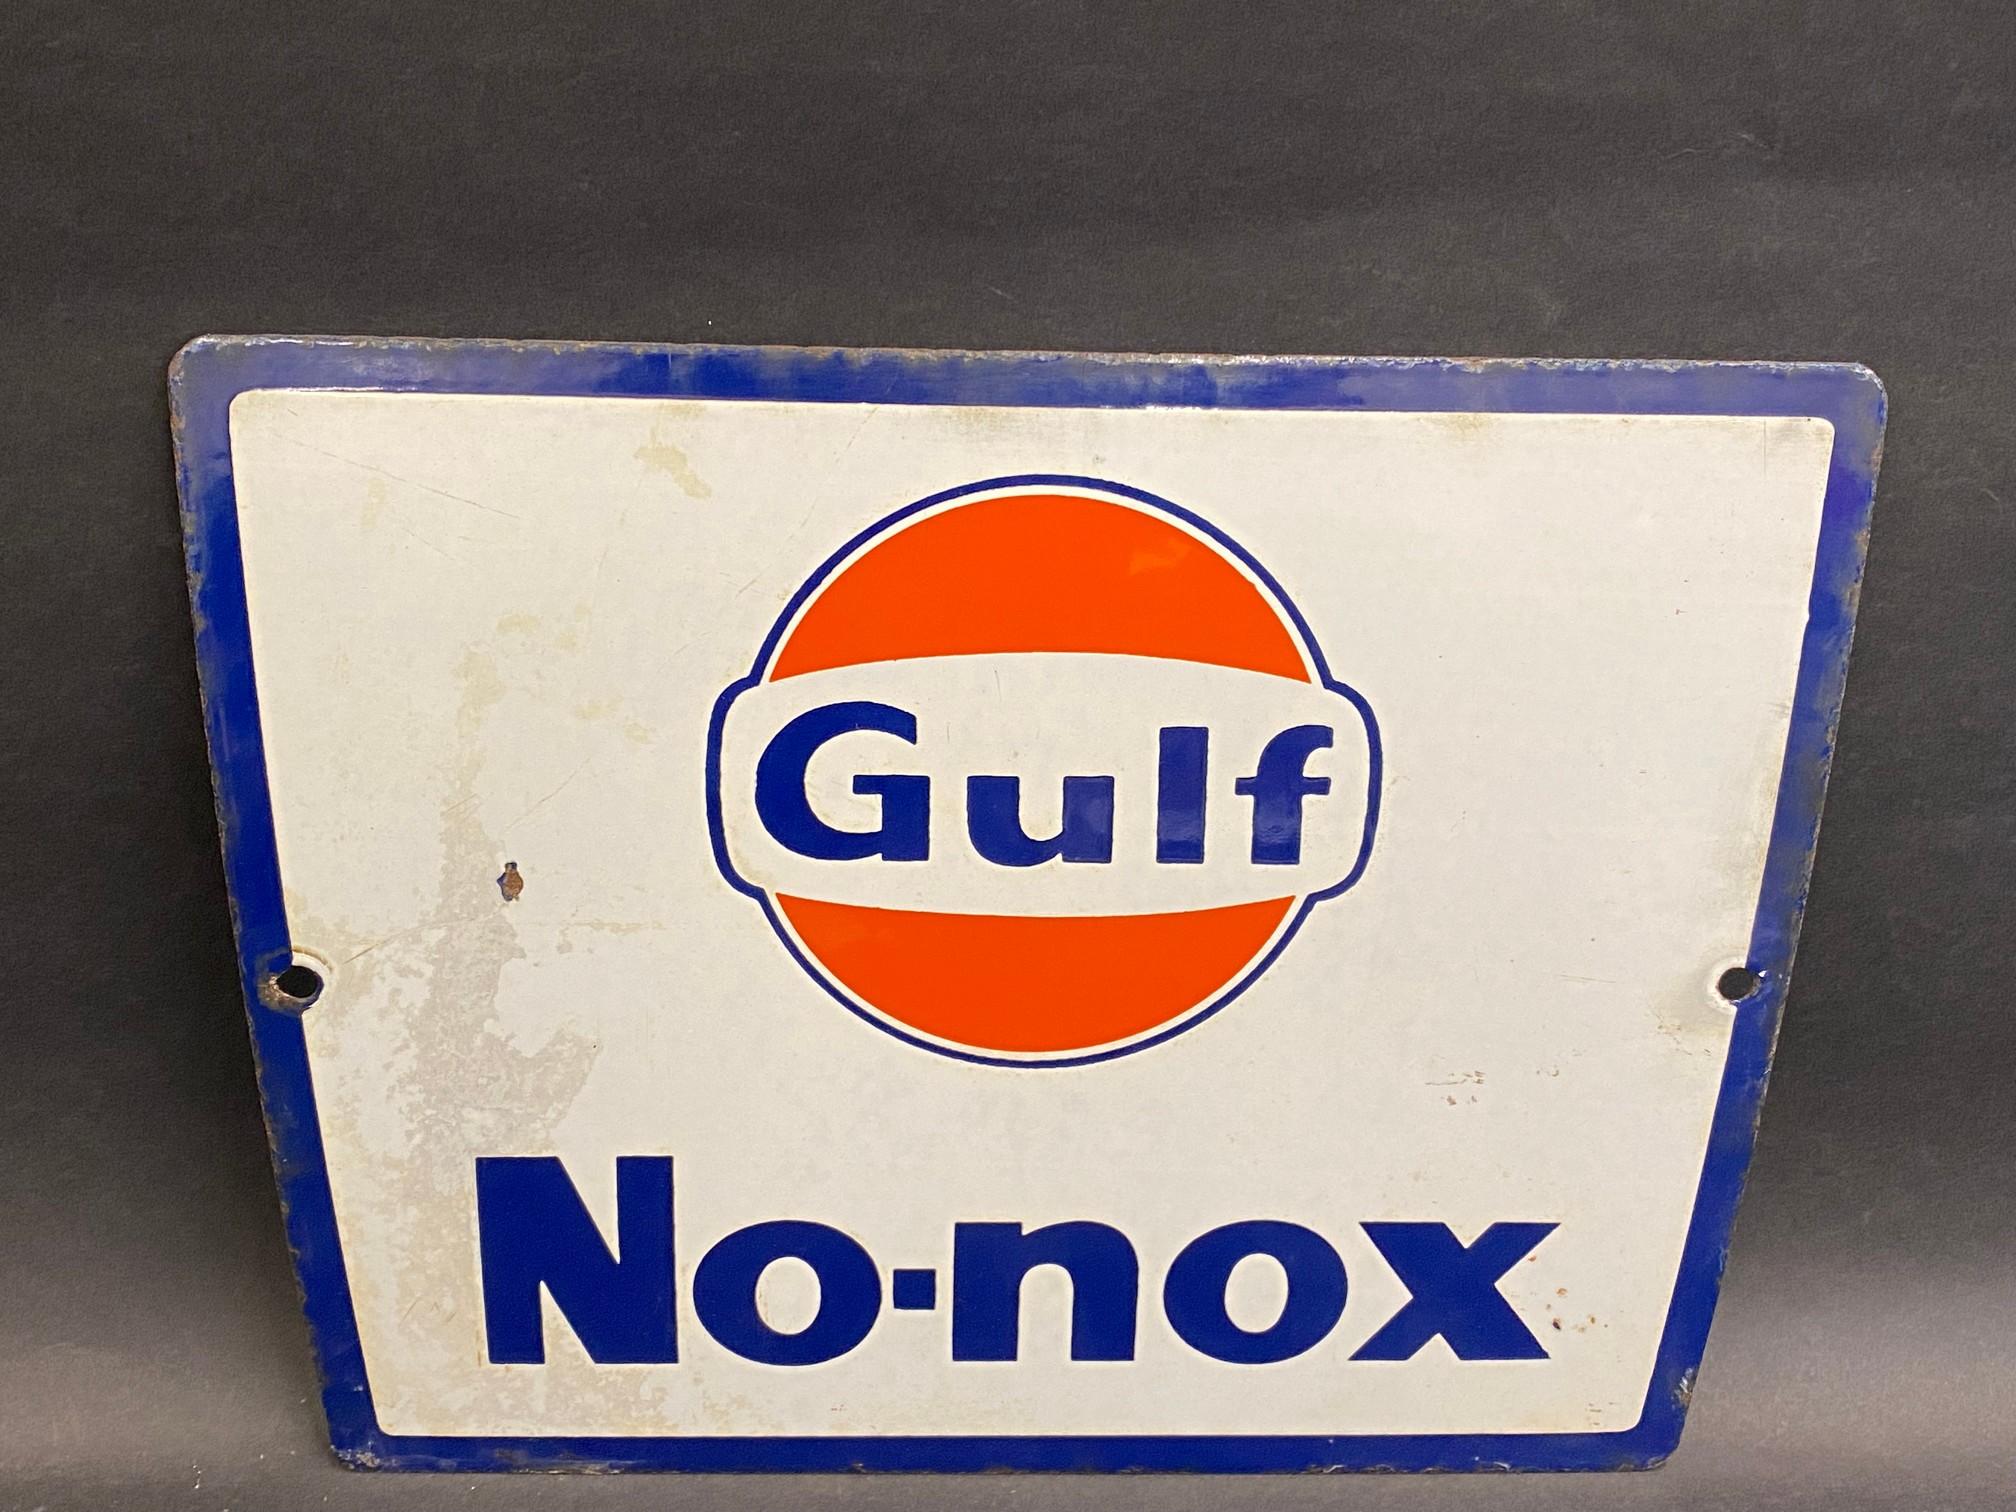 "A Gulf No-nox enamel petrol pump sign, circa late 1960s/early 1970s, 11 x 9""."